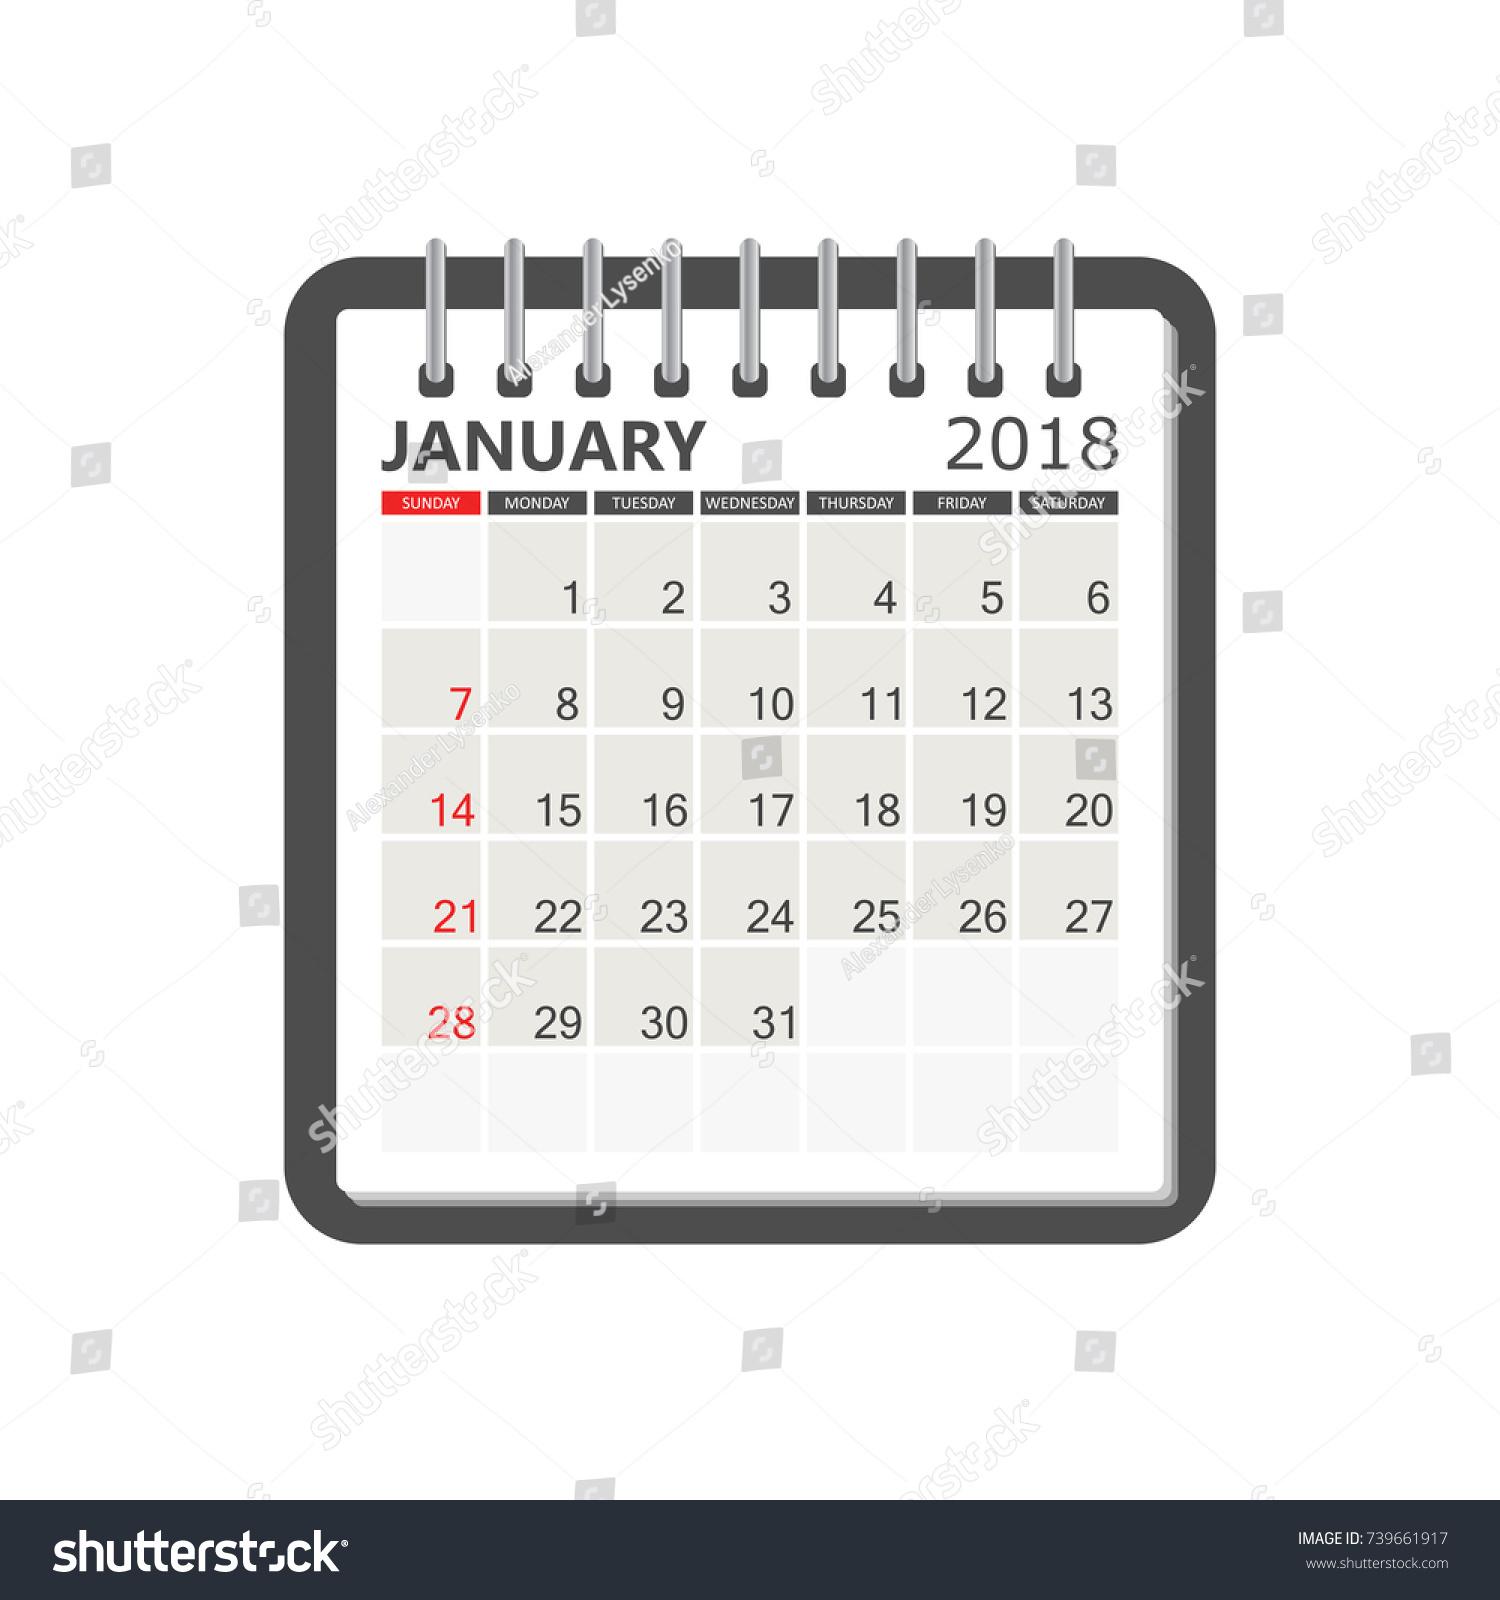 Calendar Notebook Template : January calendar notebook page stock vector